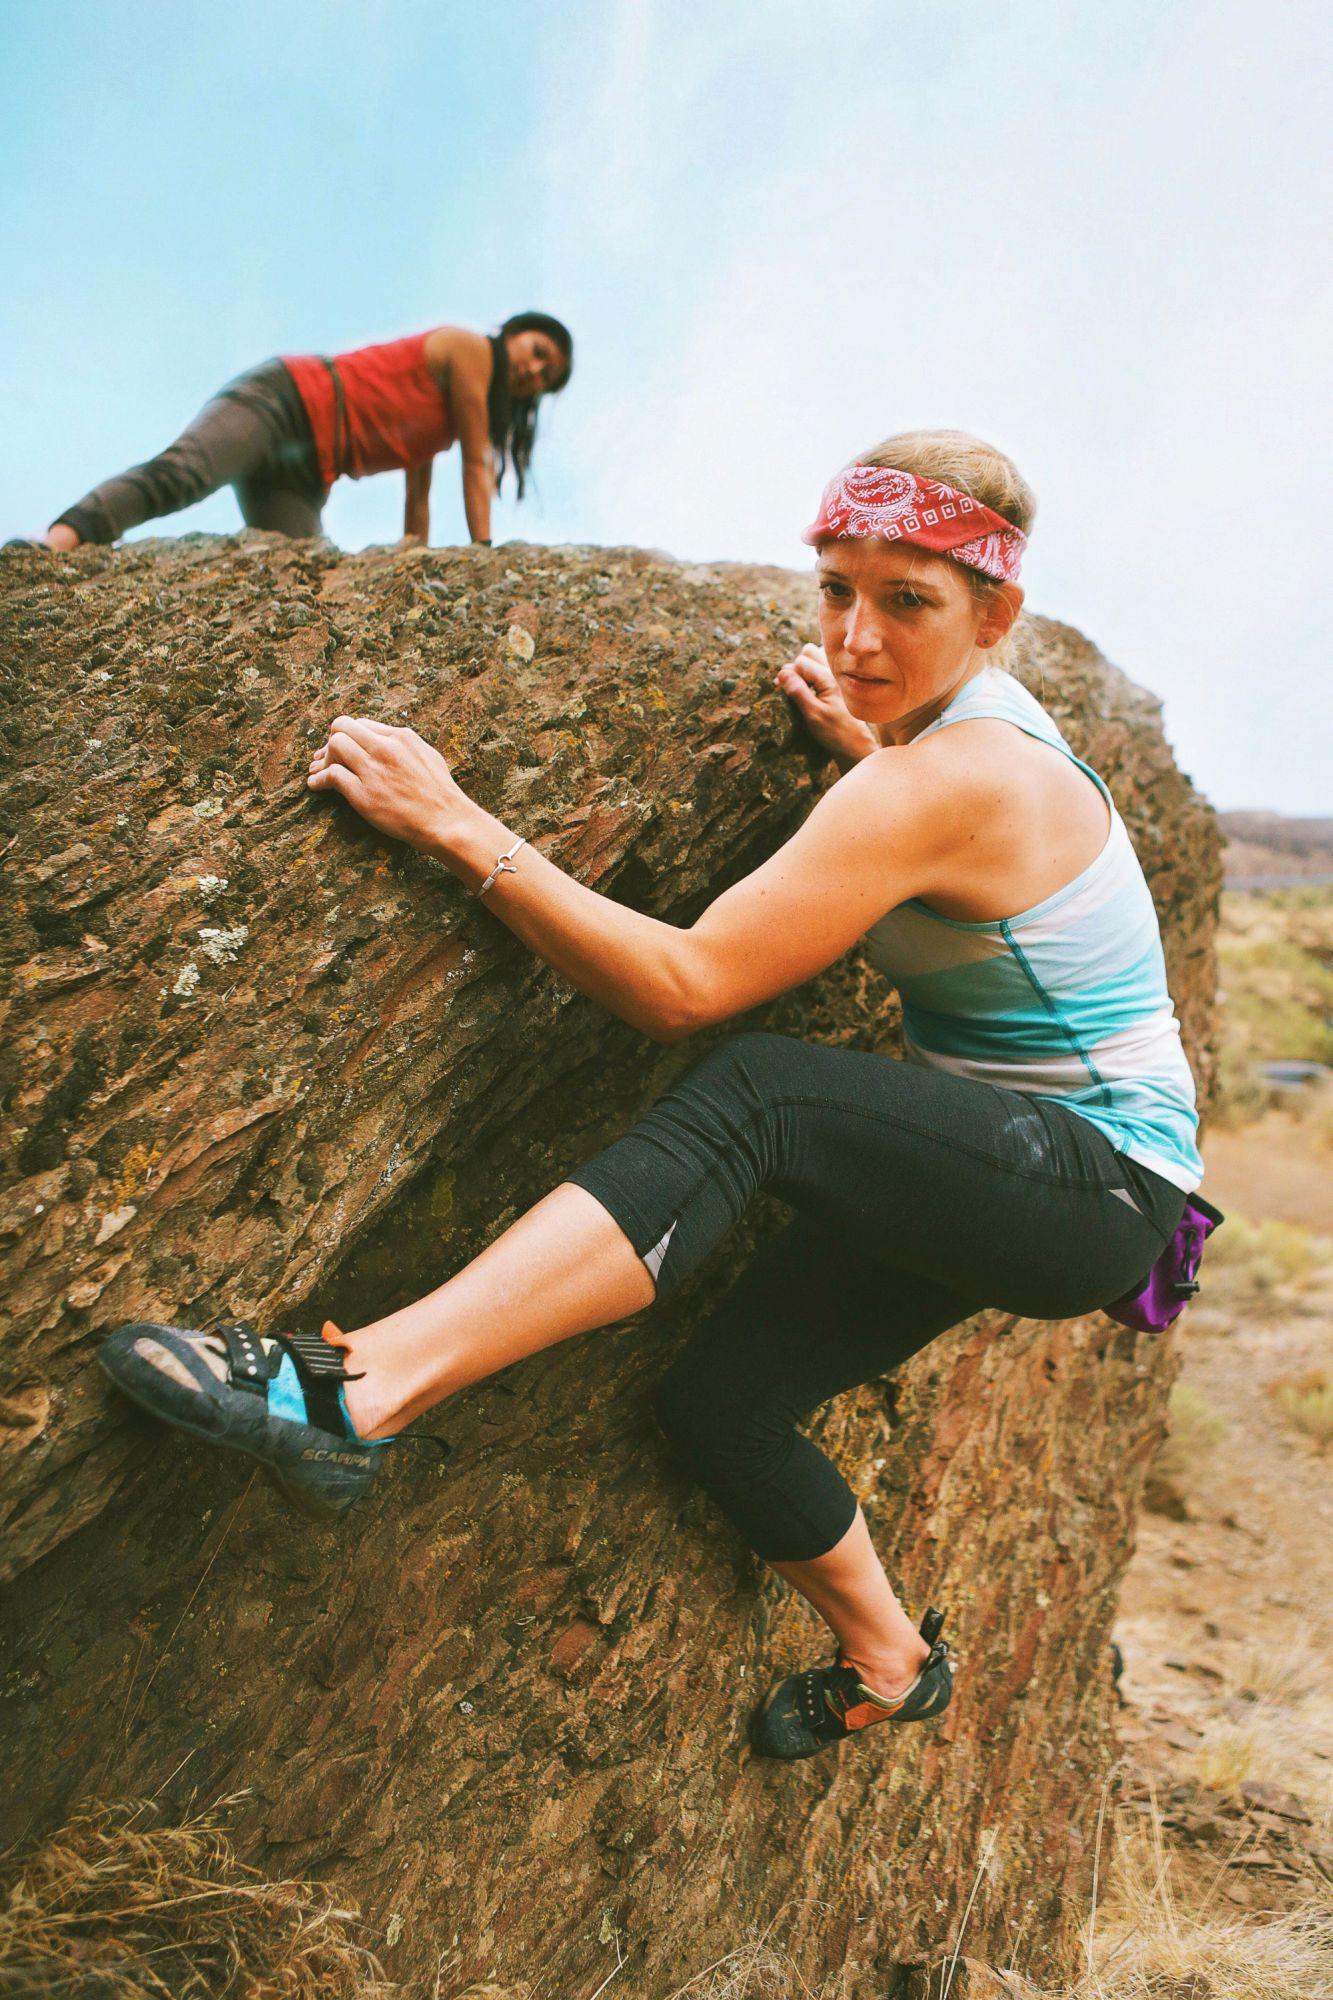 Sexist climber photoshoot